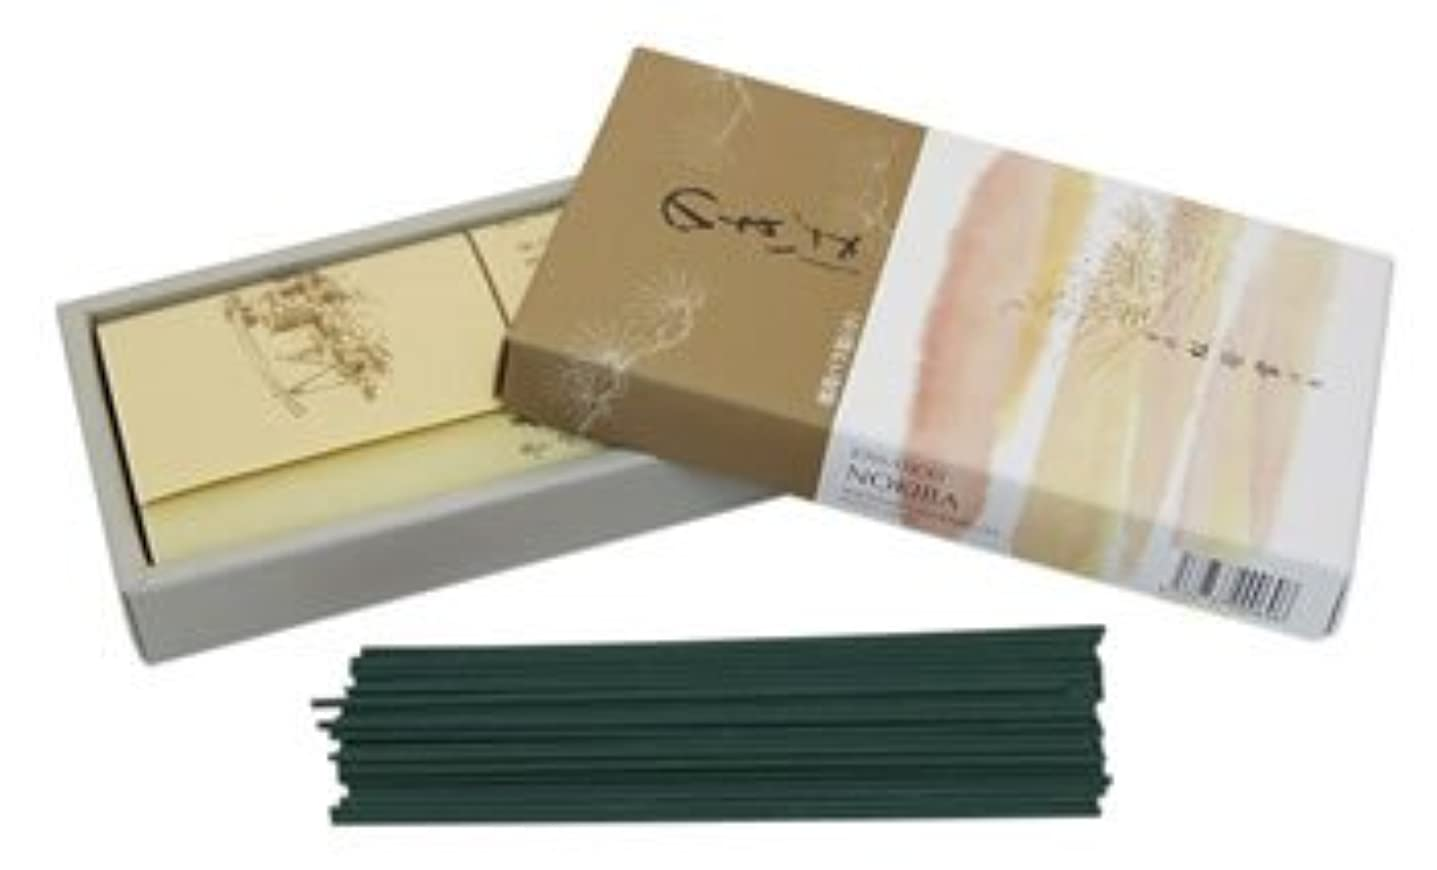 Moss Garden (Nokiba) With Sandalwood - Shoyeido Classic Japanese Incense - Box of 250 Sticks